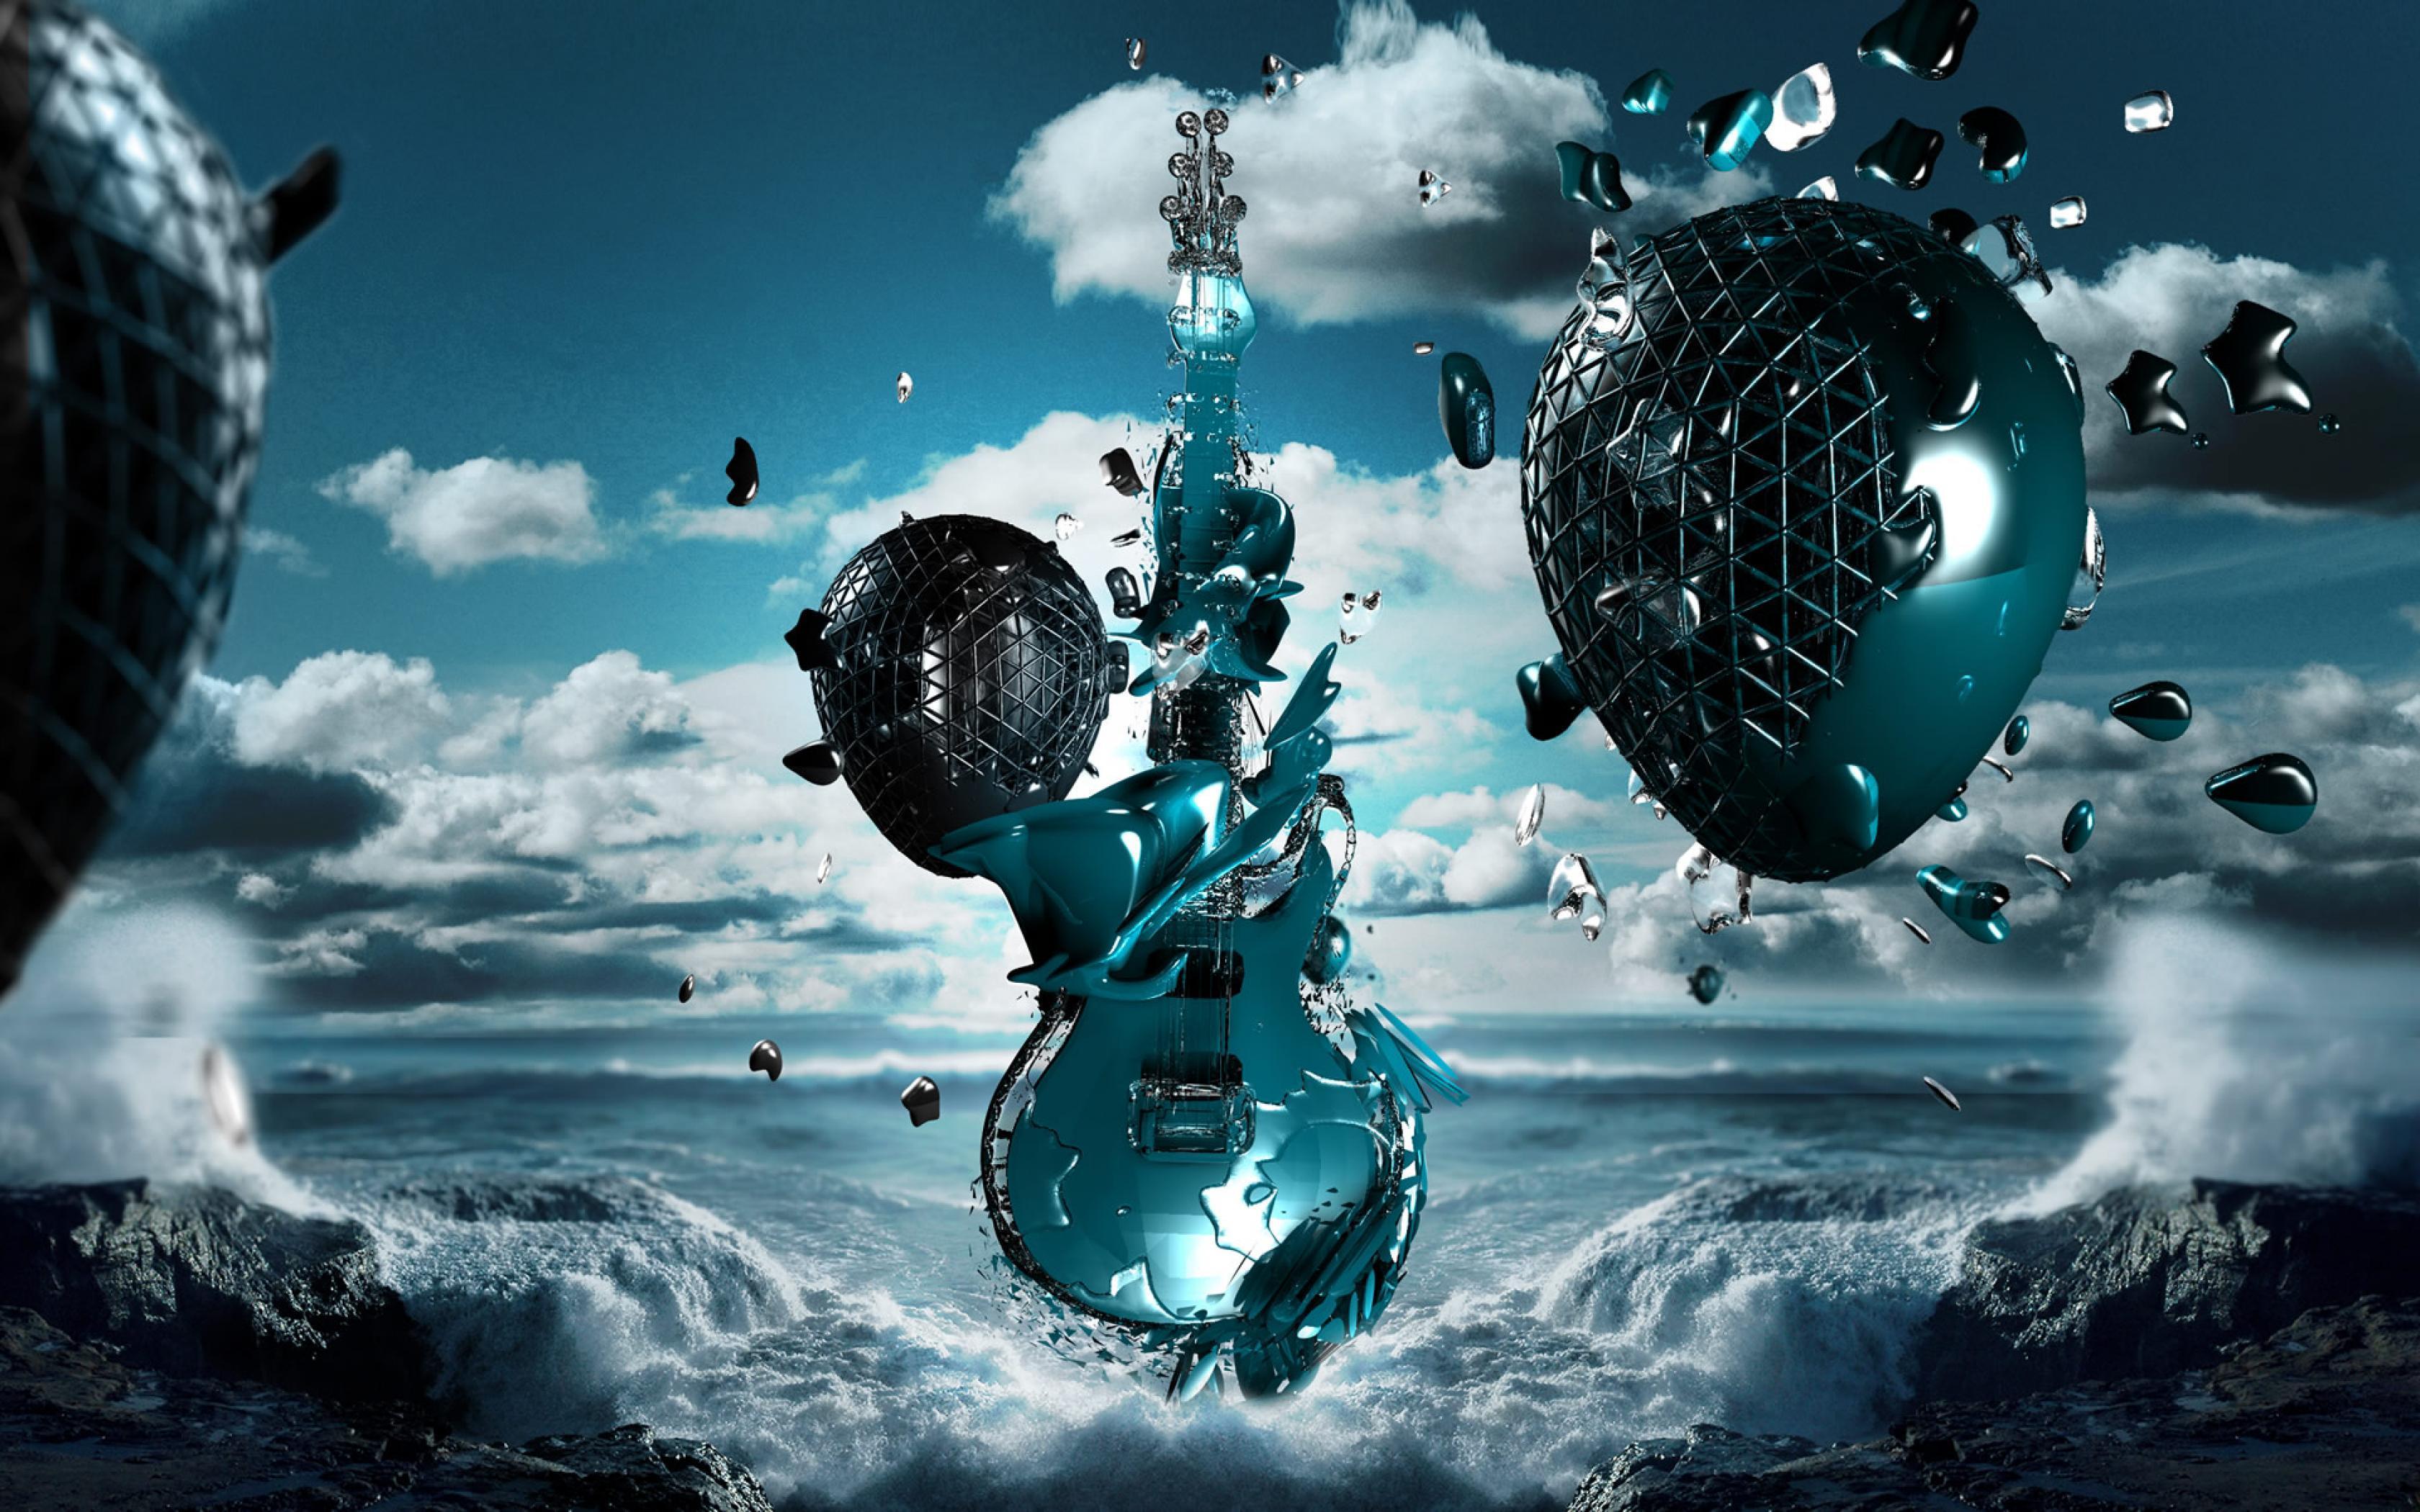 гитара, шары, небо, облака, океан, волны